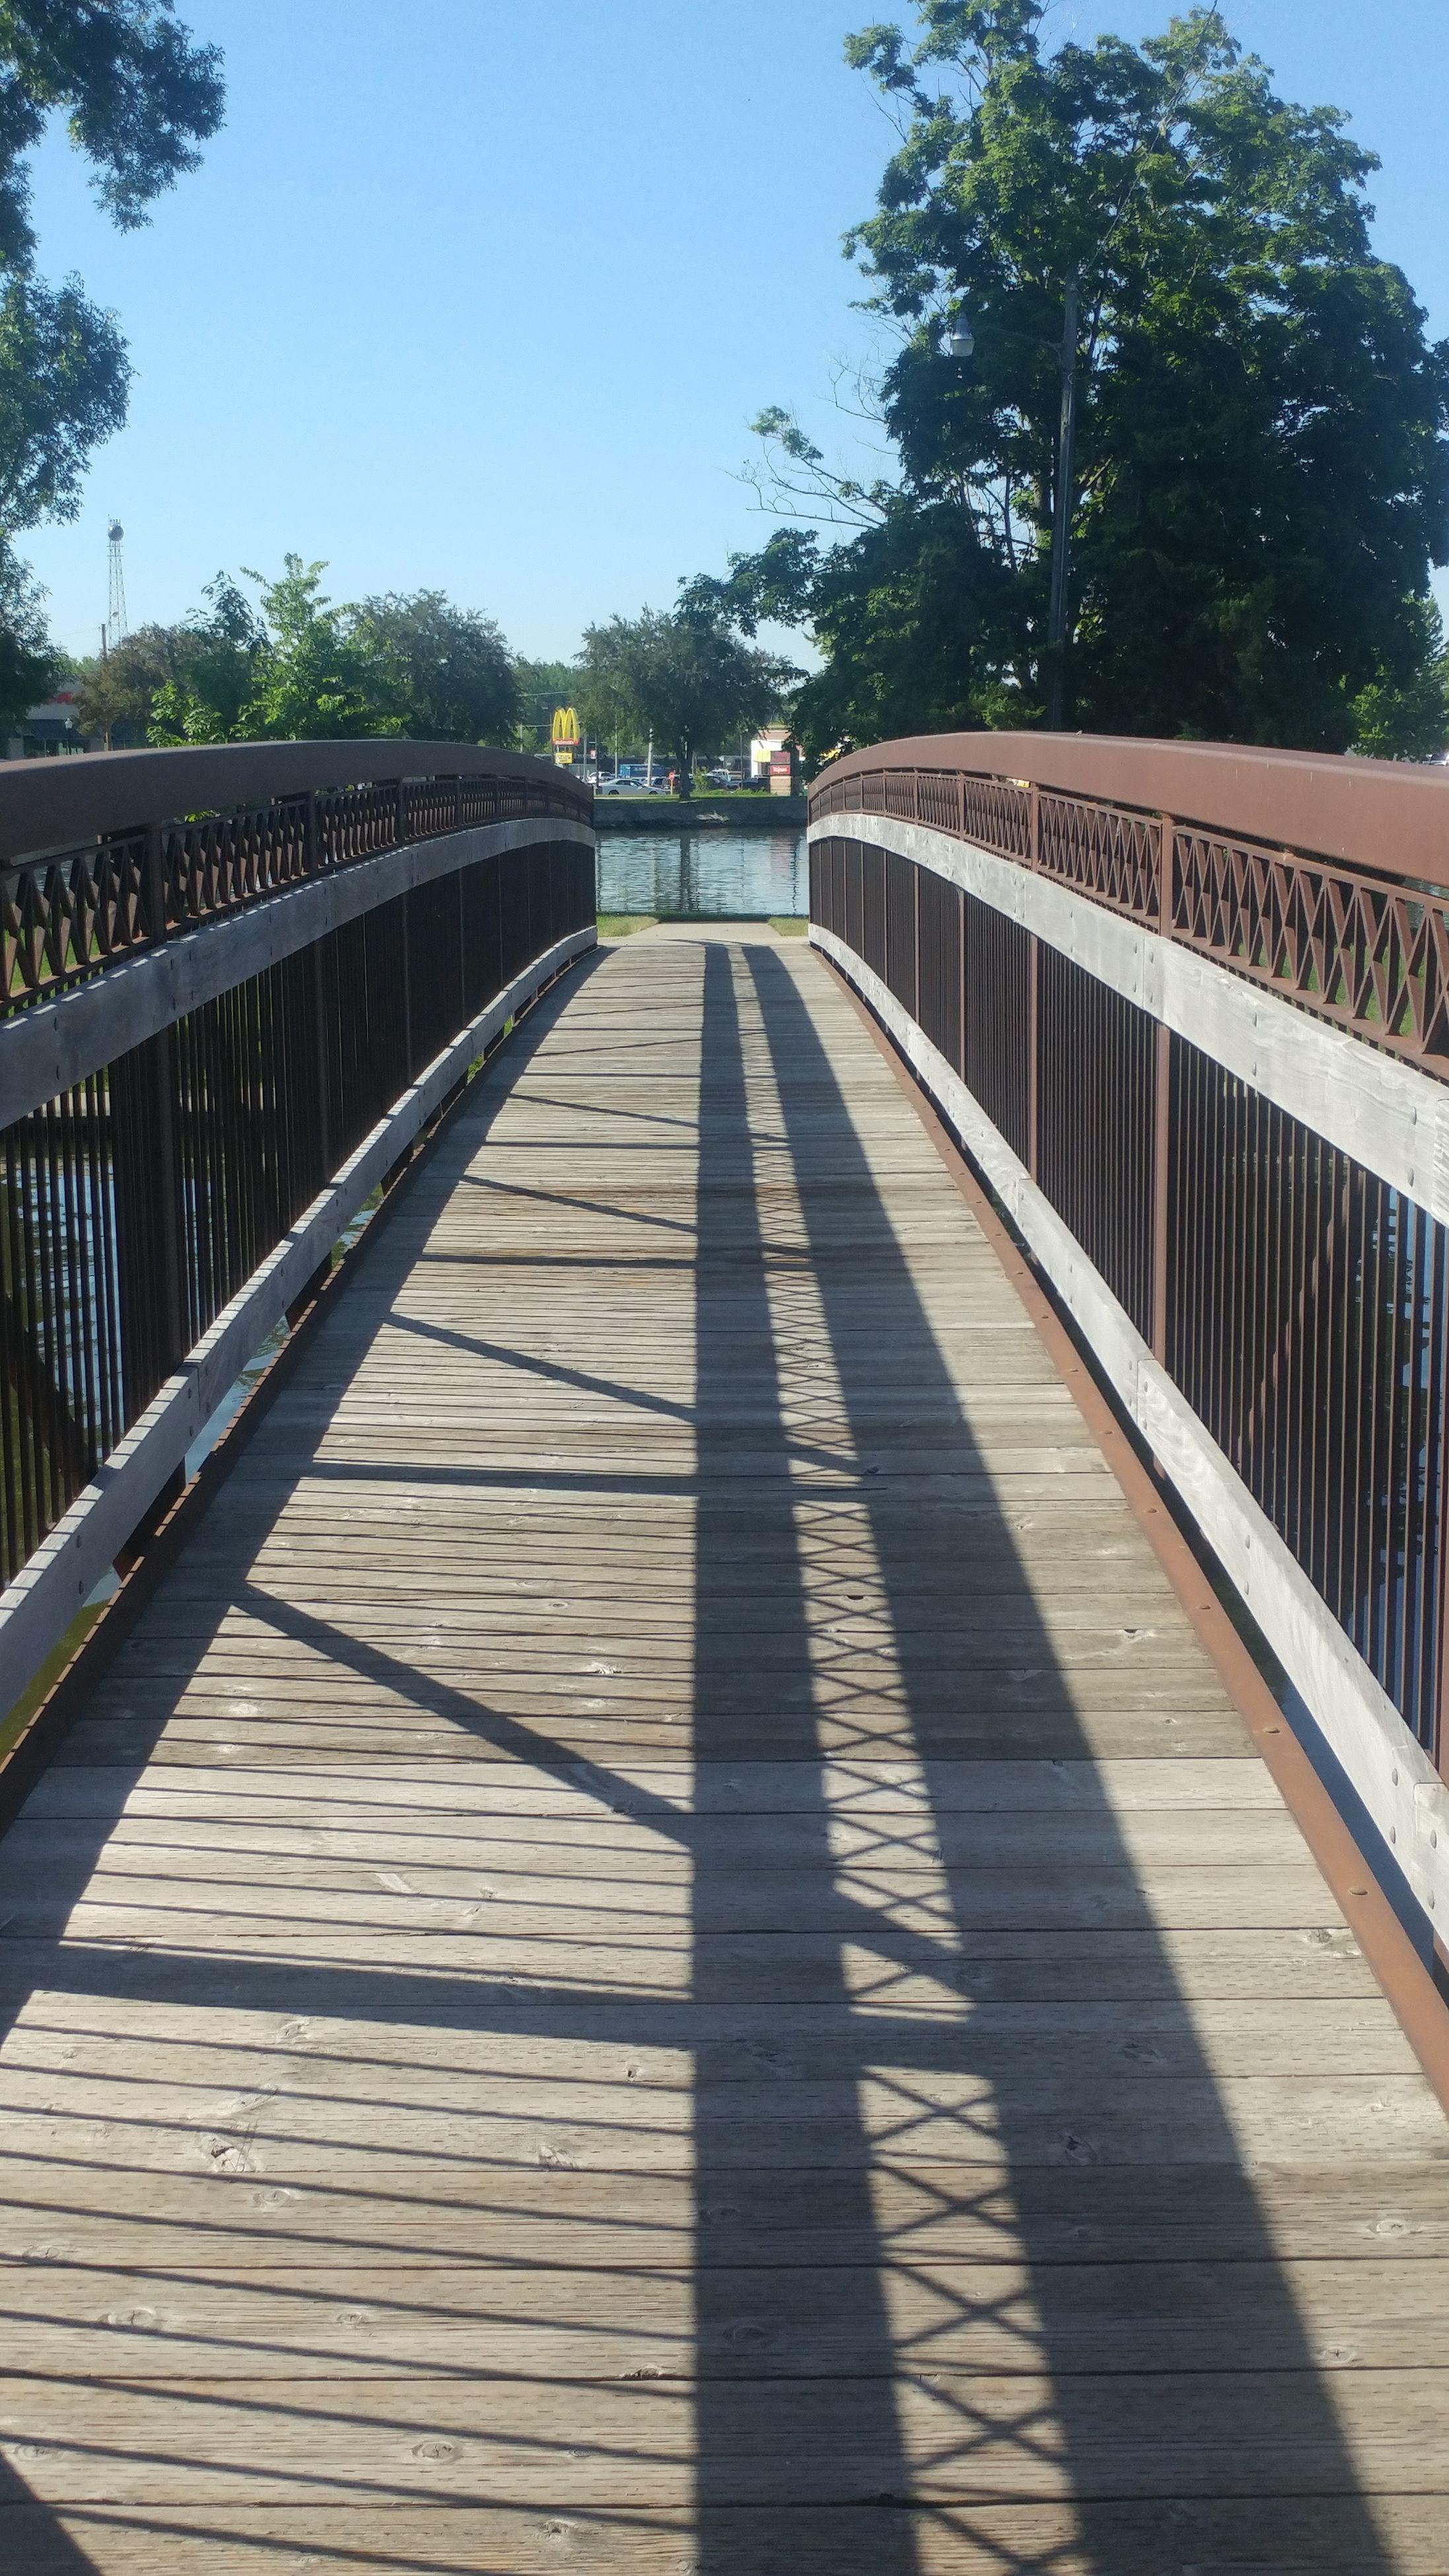 railing, shadow, sunlight, tree, footbridge, the way forward, day, outdoors, clear sky, no people, sky